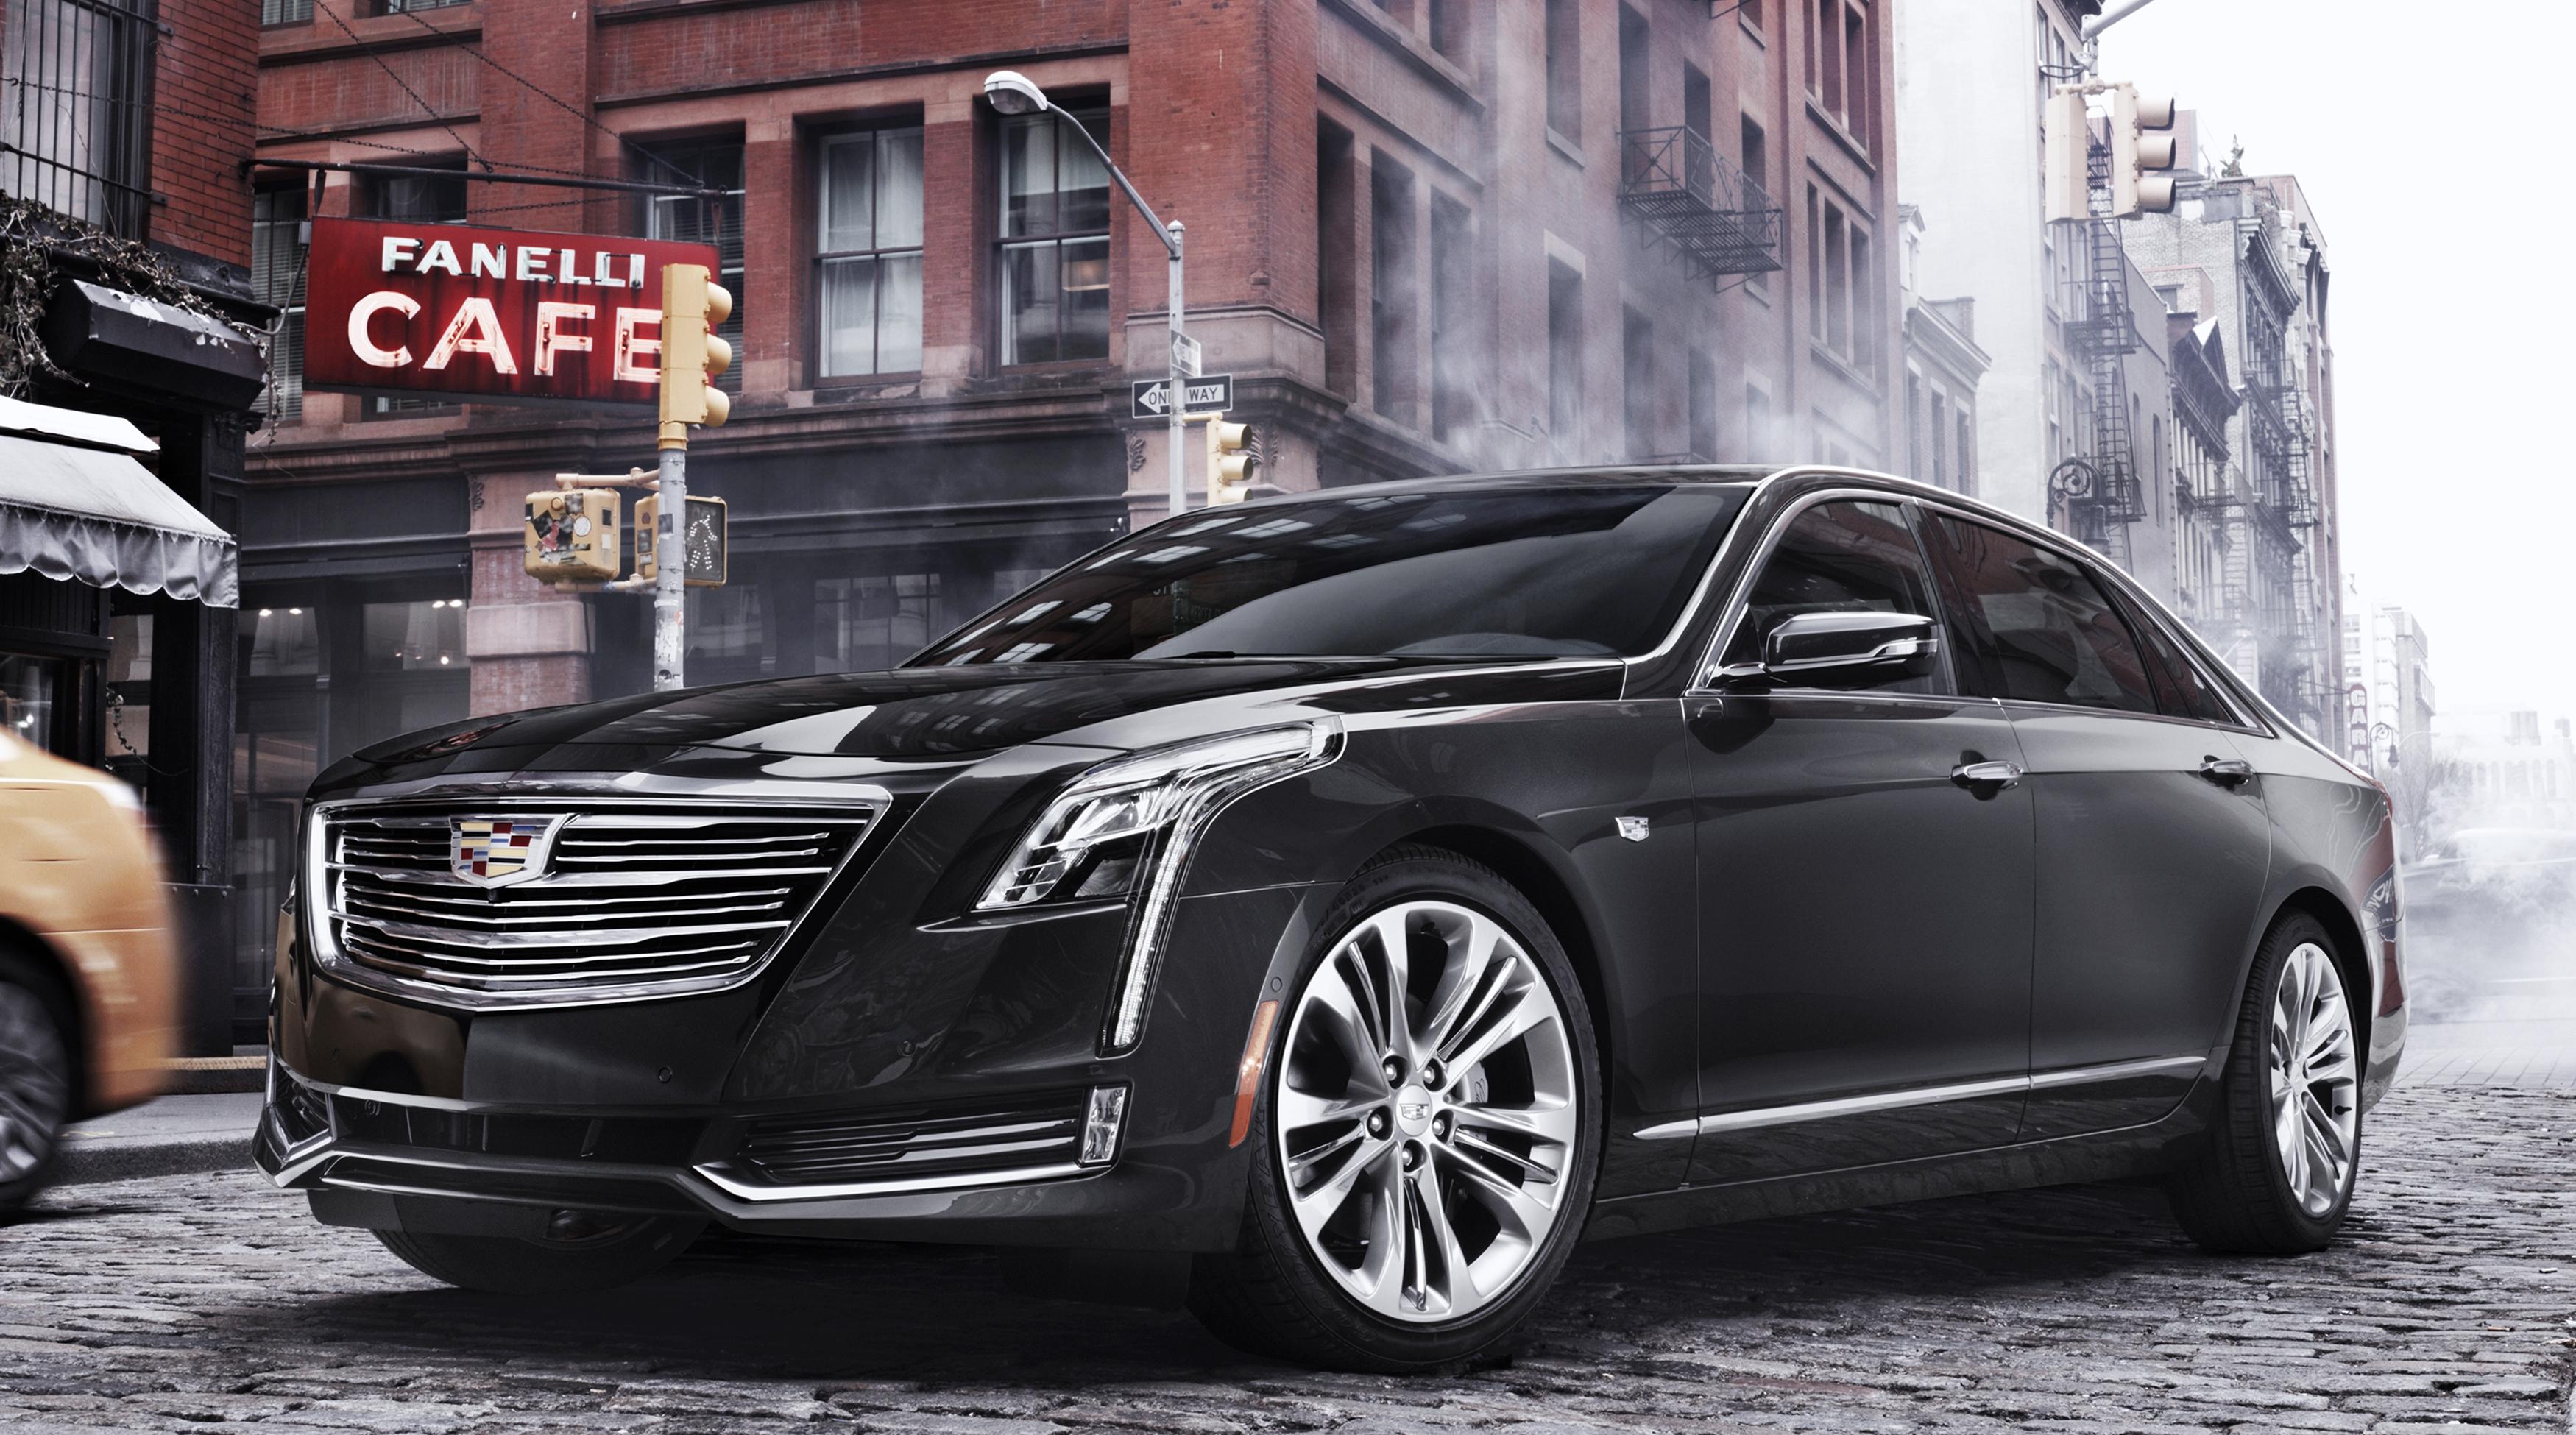 2016-Cadillac-CT6-022.jpg